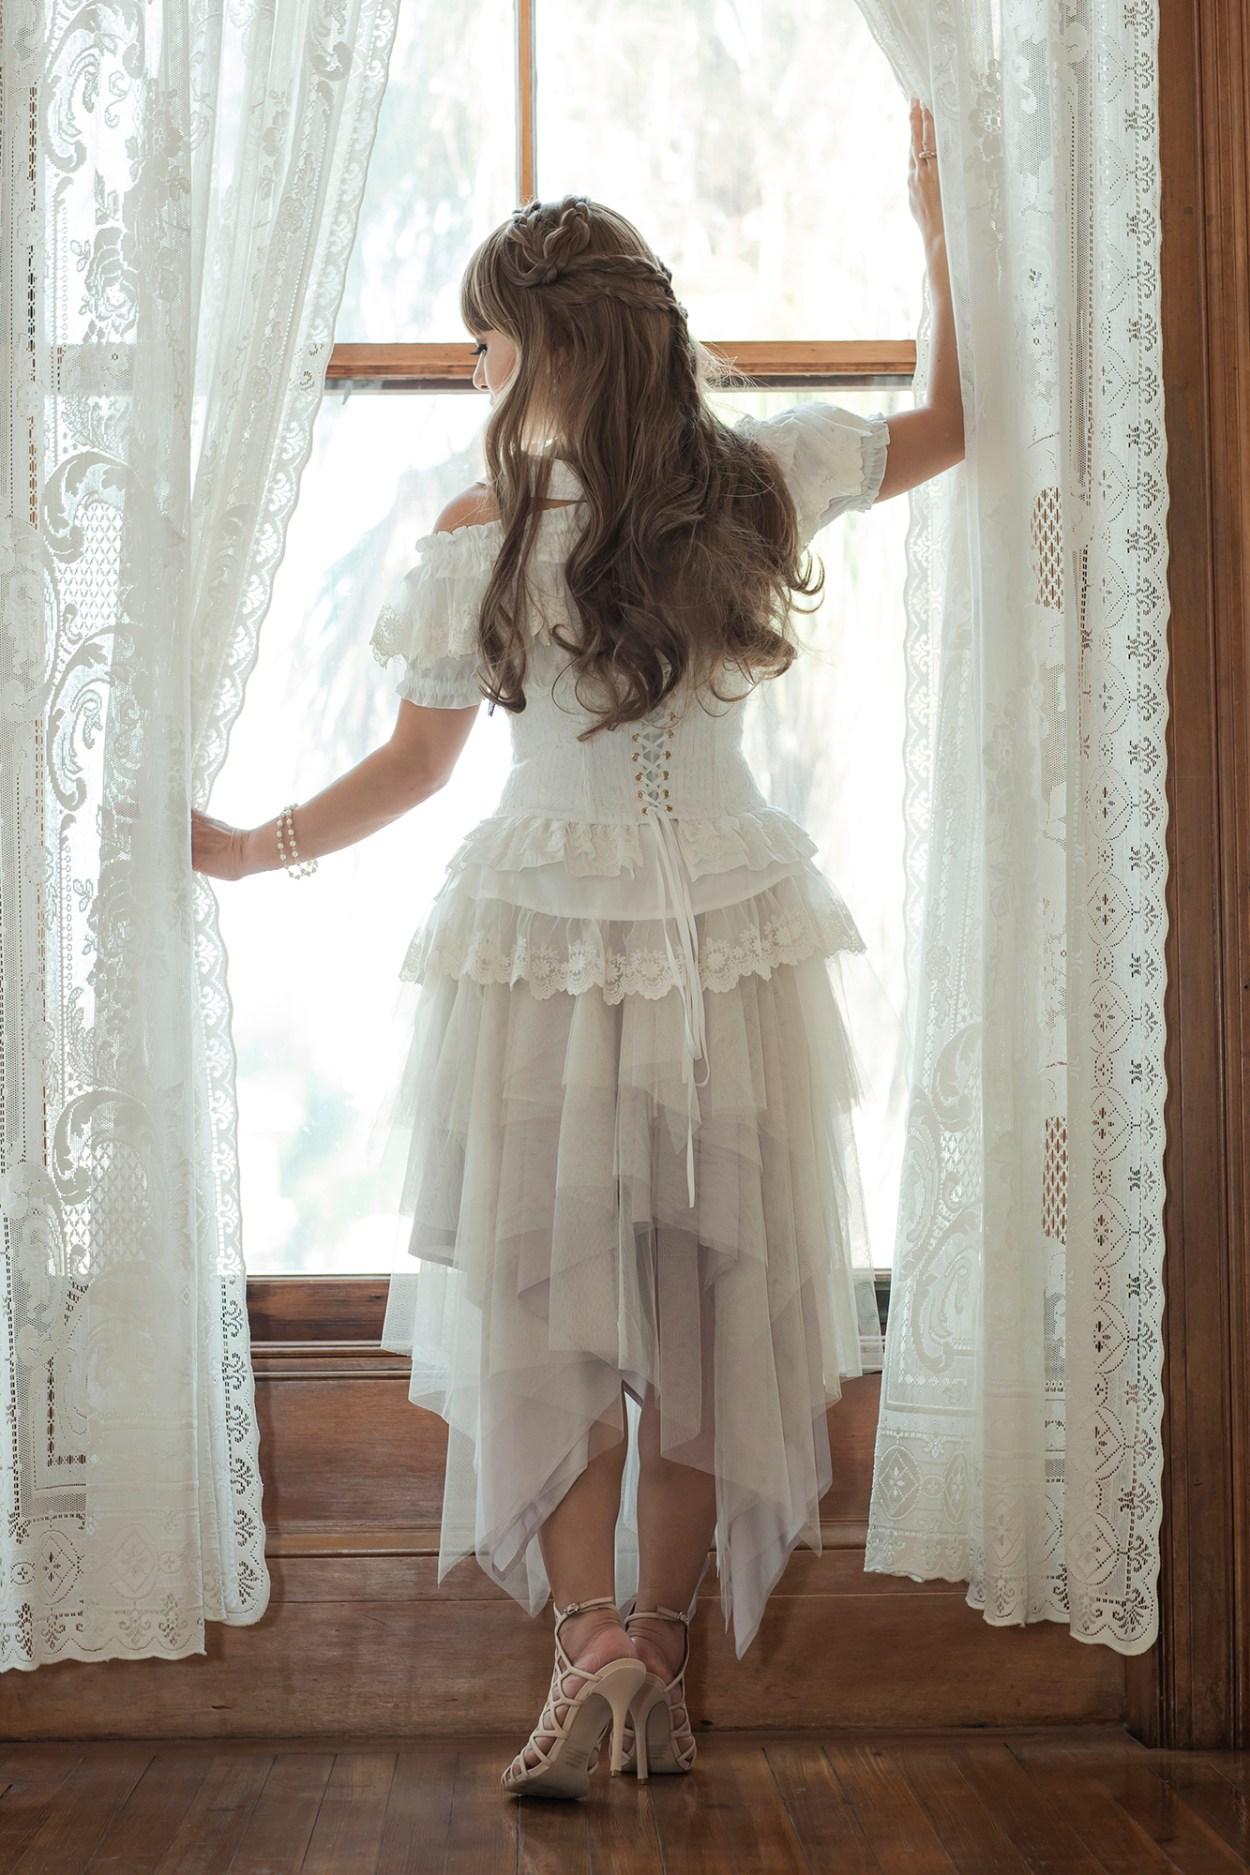 30-Sheglit-Ivory-Dress-Fashion-JFashion-Style-Victorian-Lolita-Moody